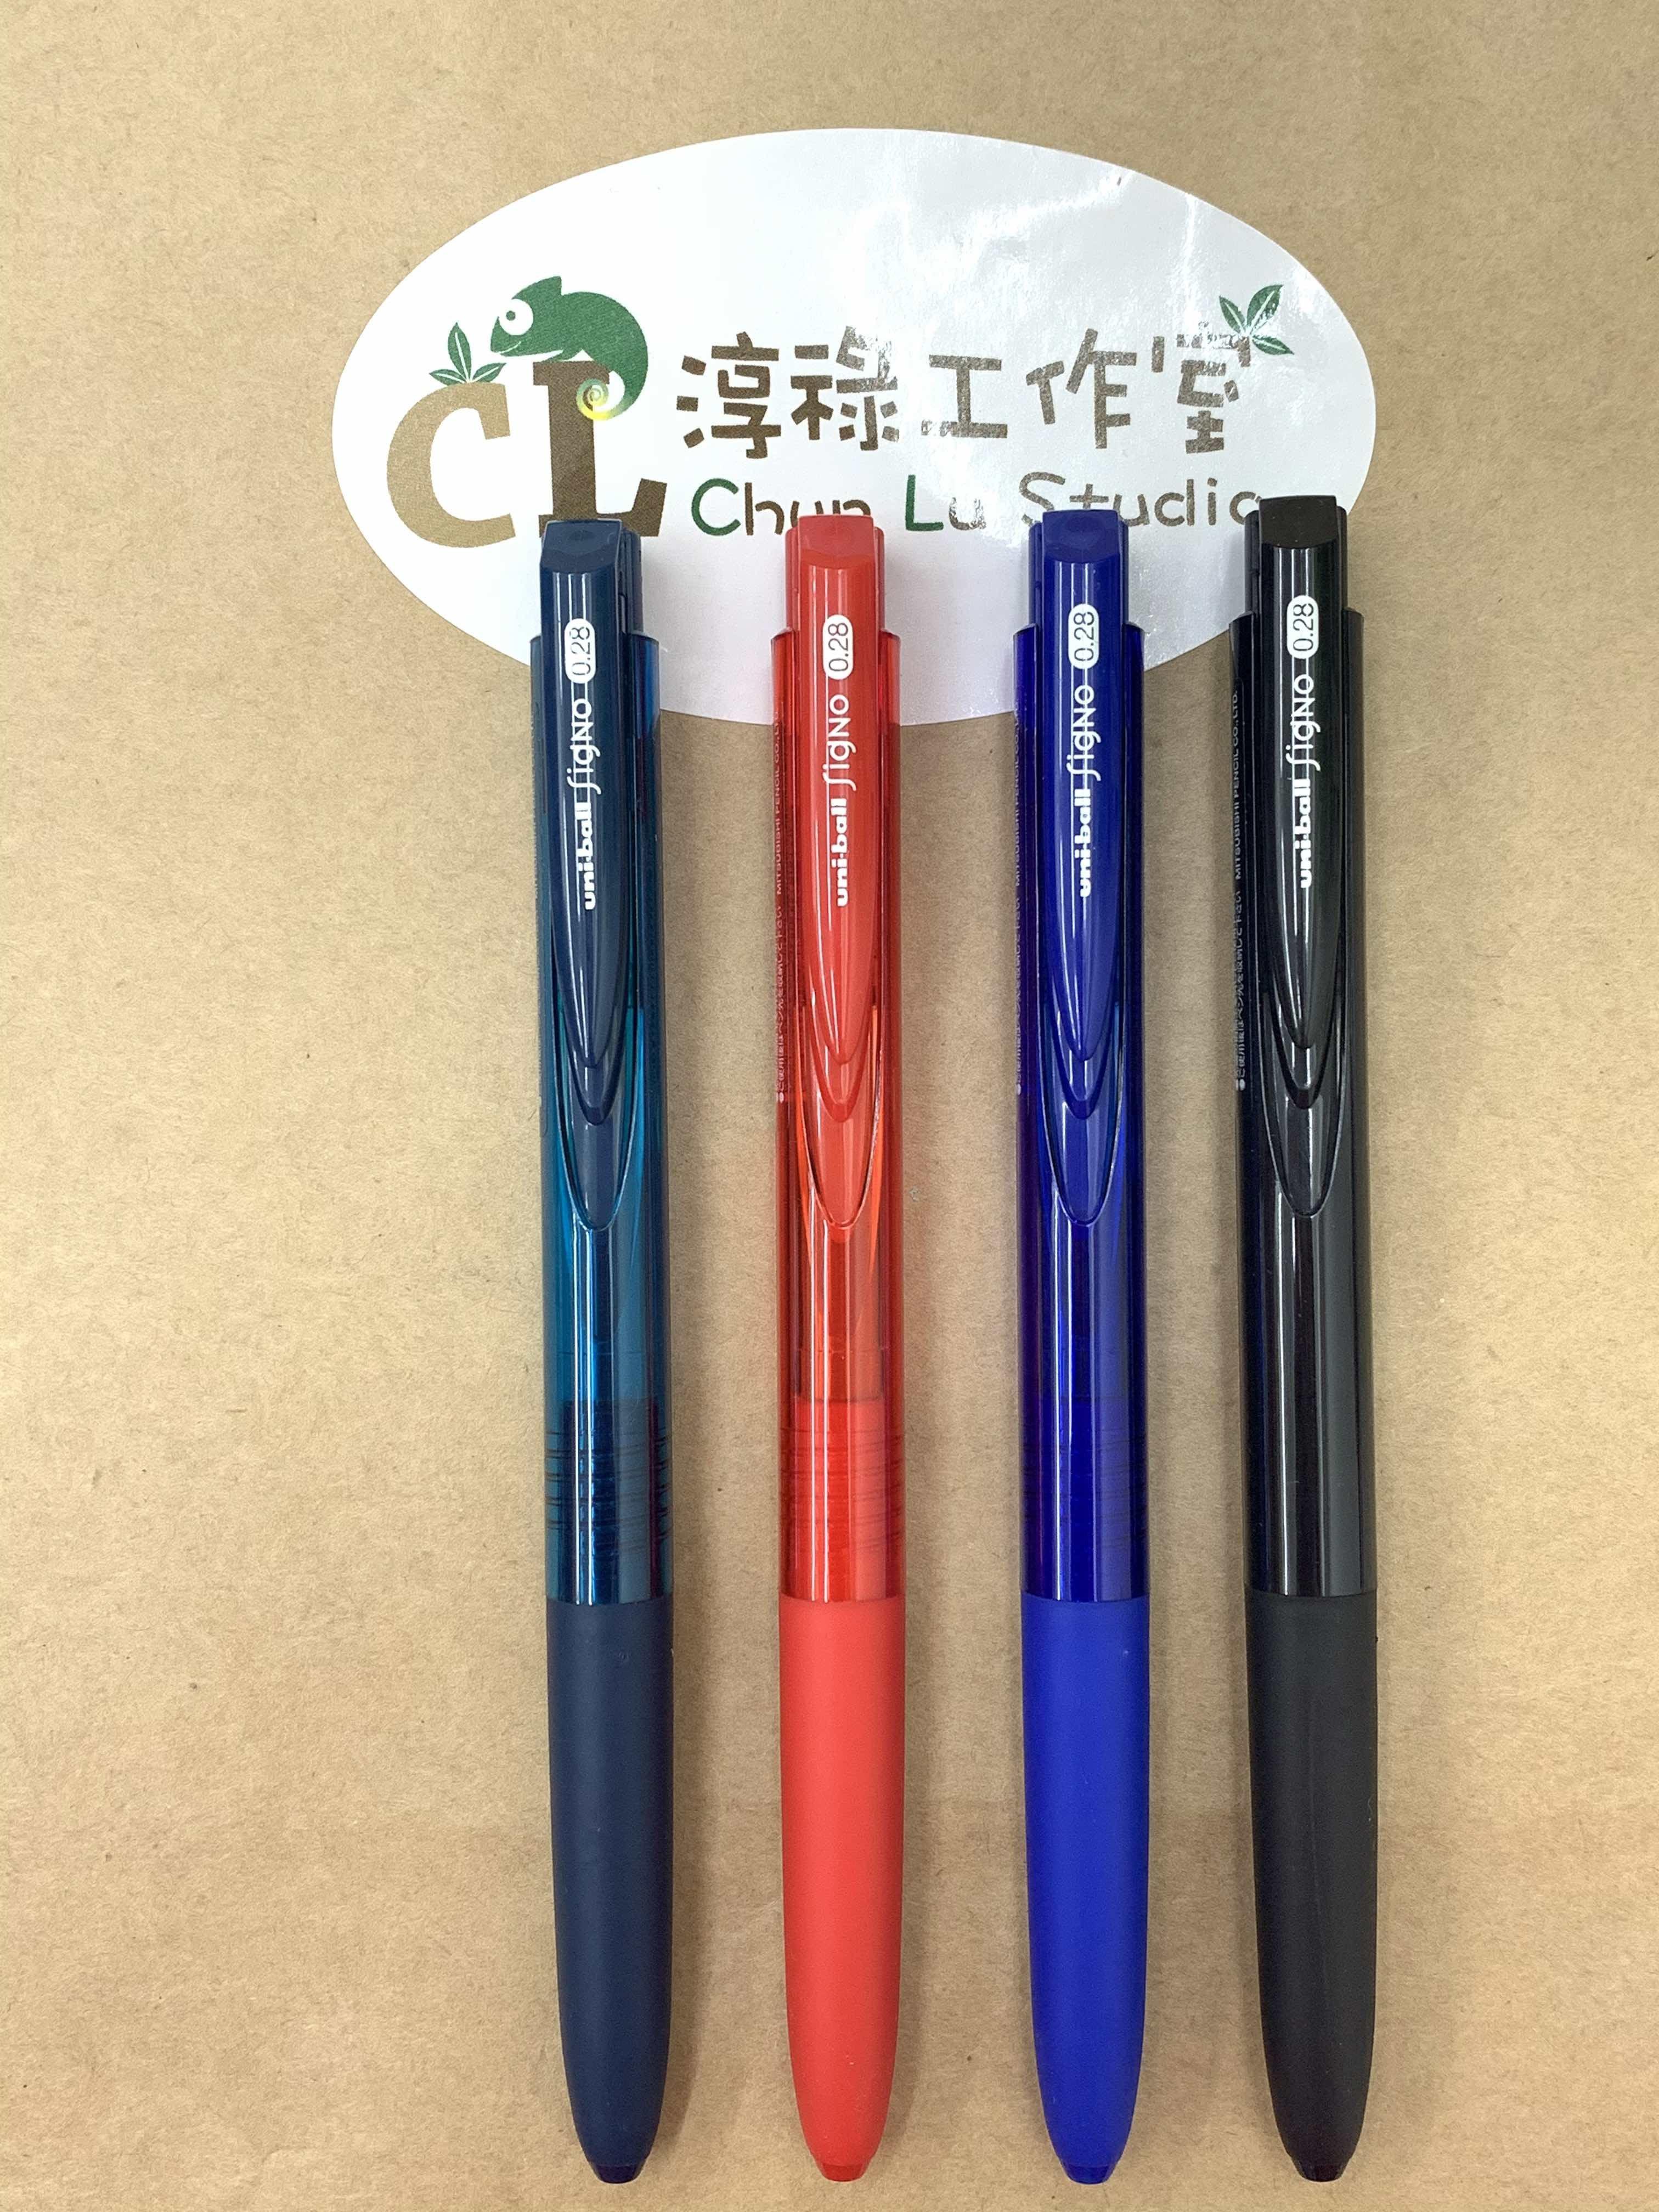 淳祿工作室-UNI 三菱 uni-ball SigNO RT1 UMN-155-28 0.28mm 原子筆